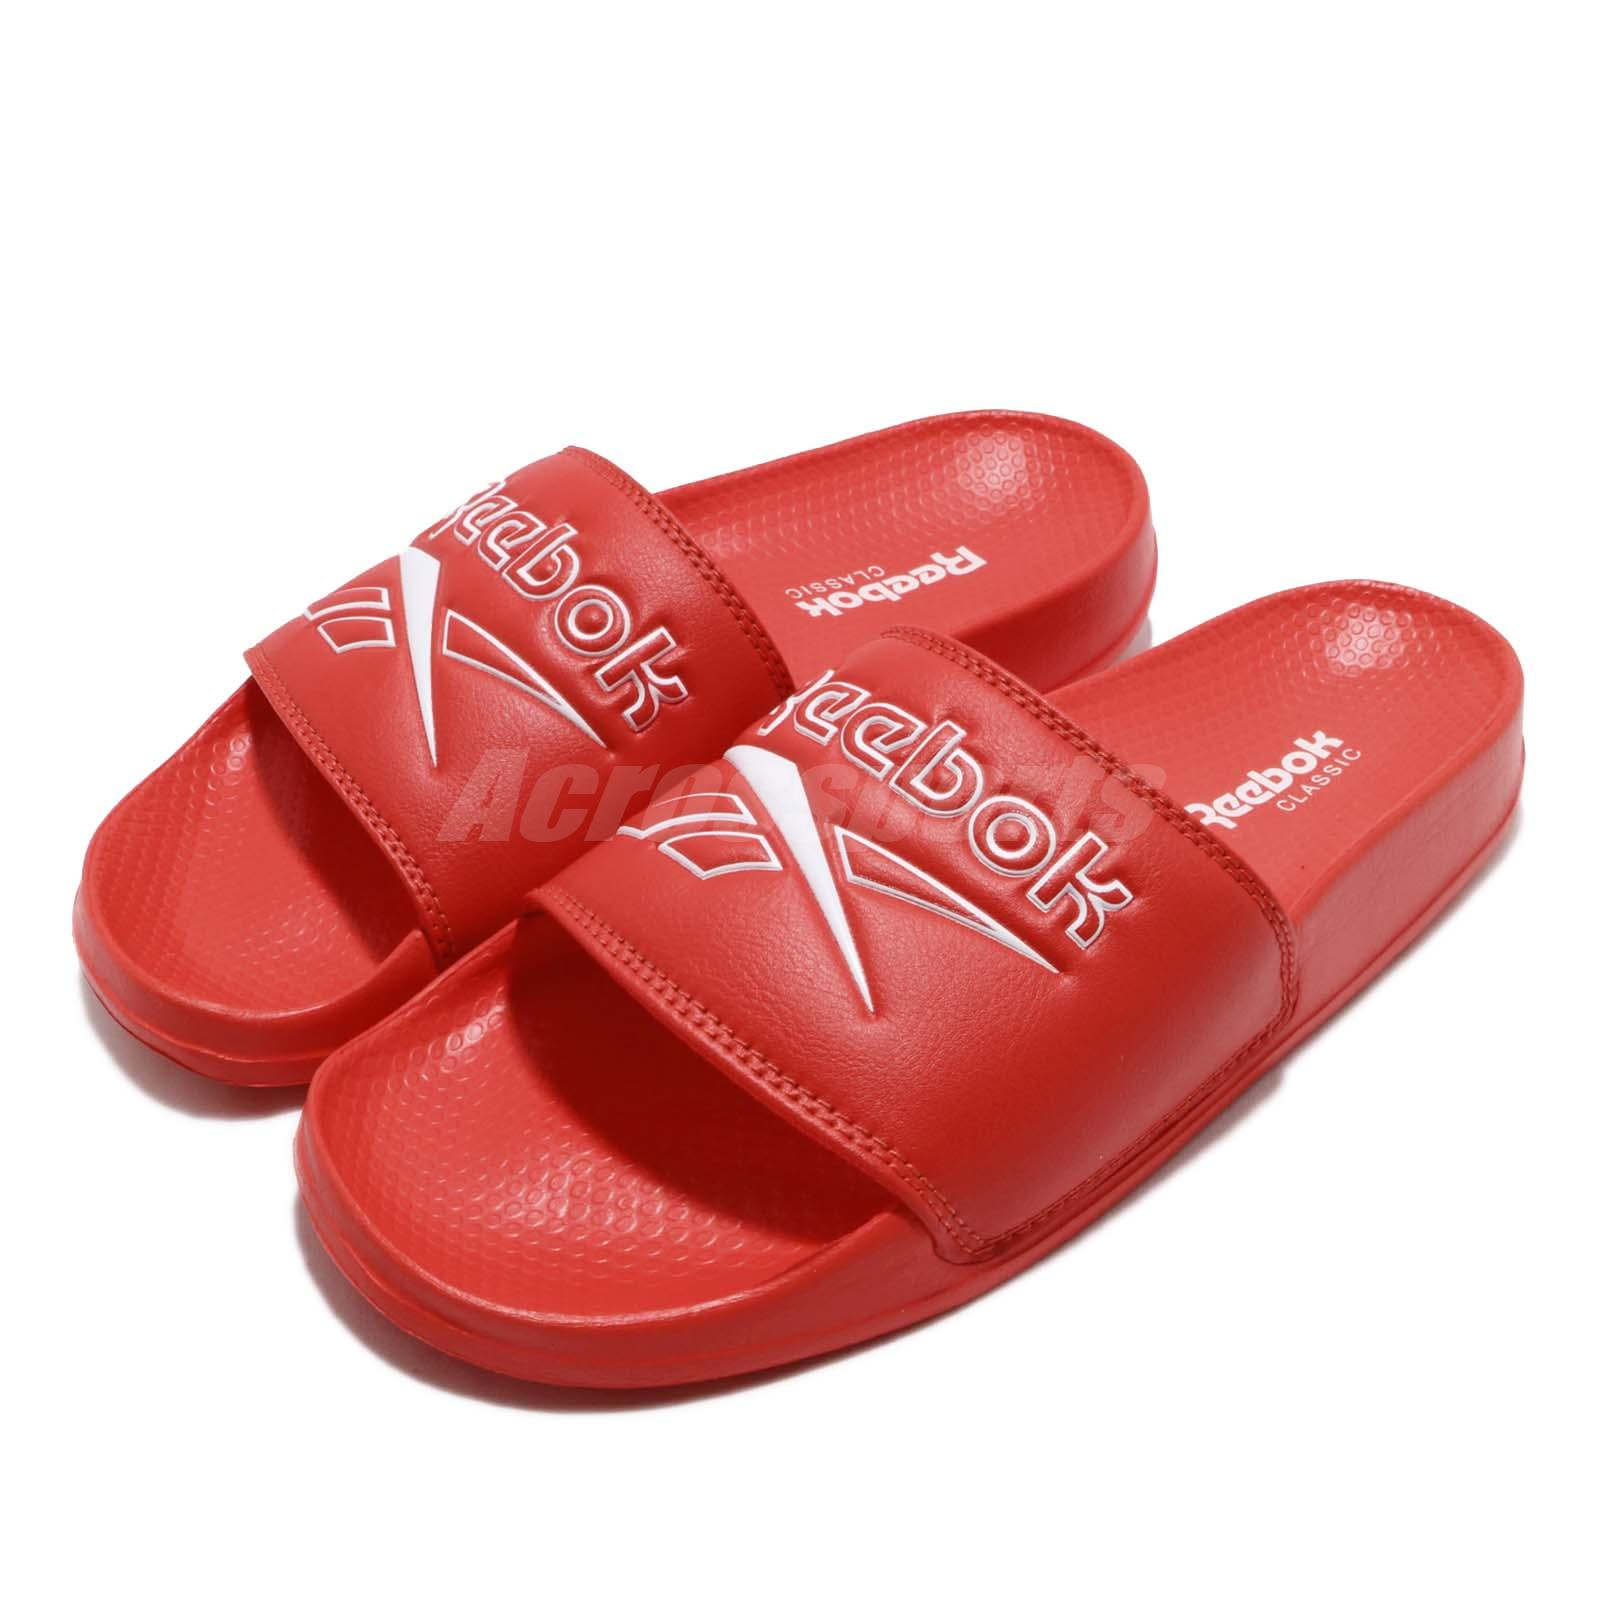 reebok classic sandals - 65% OFF